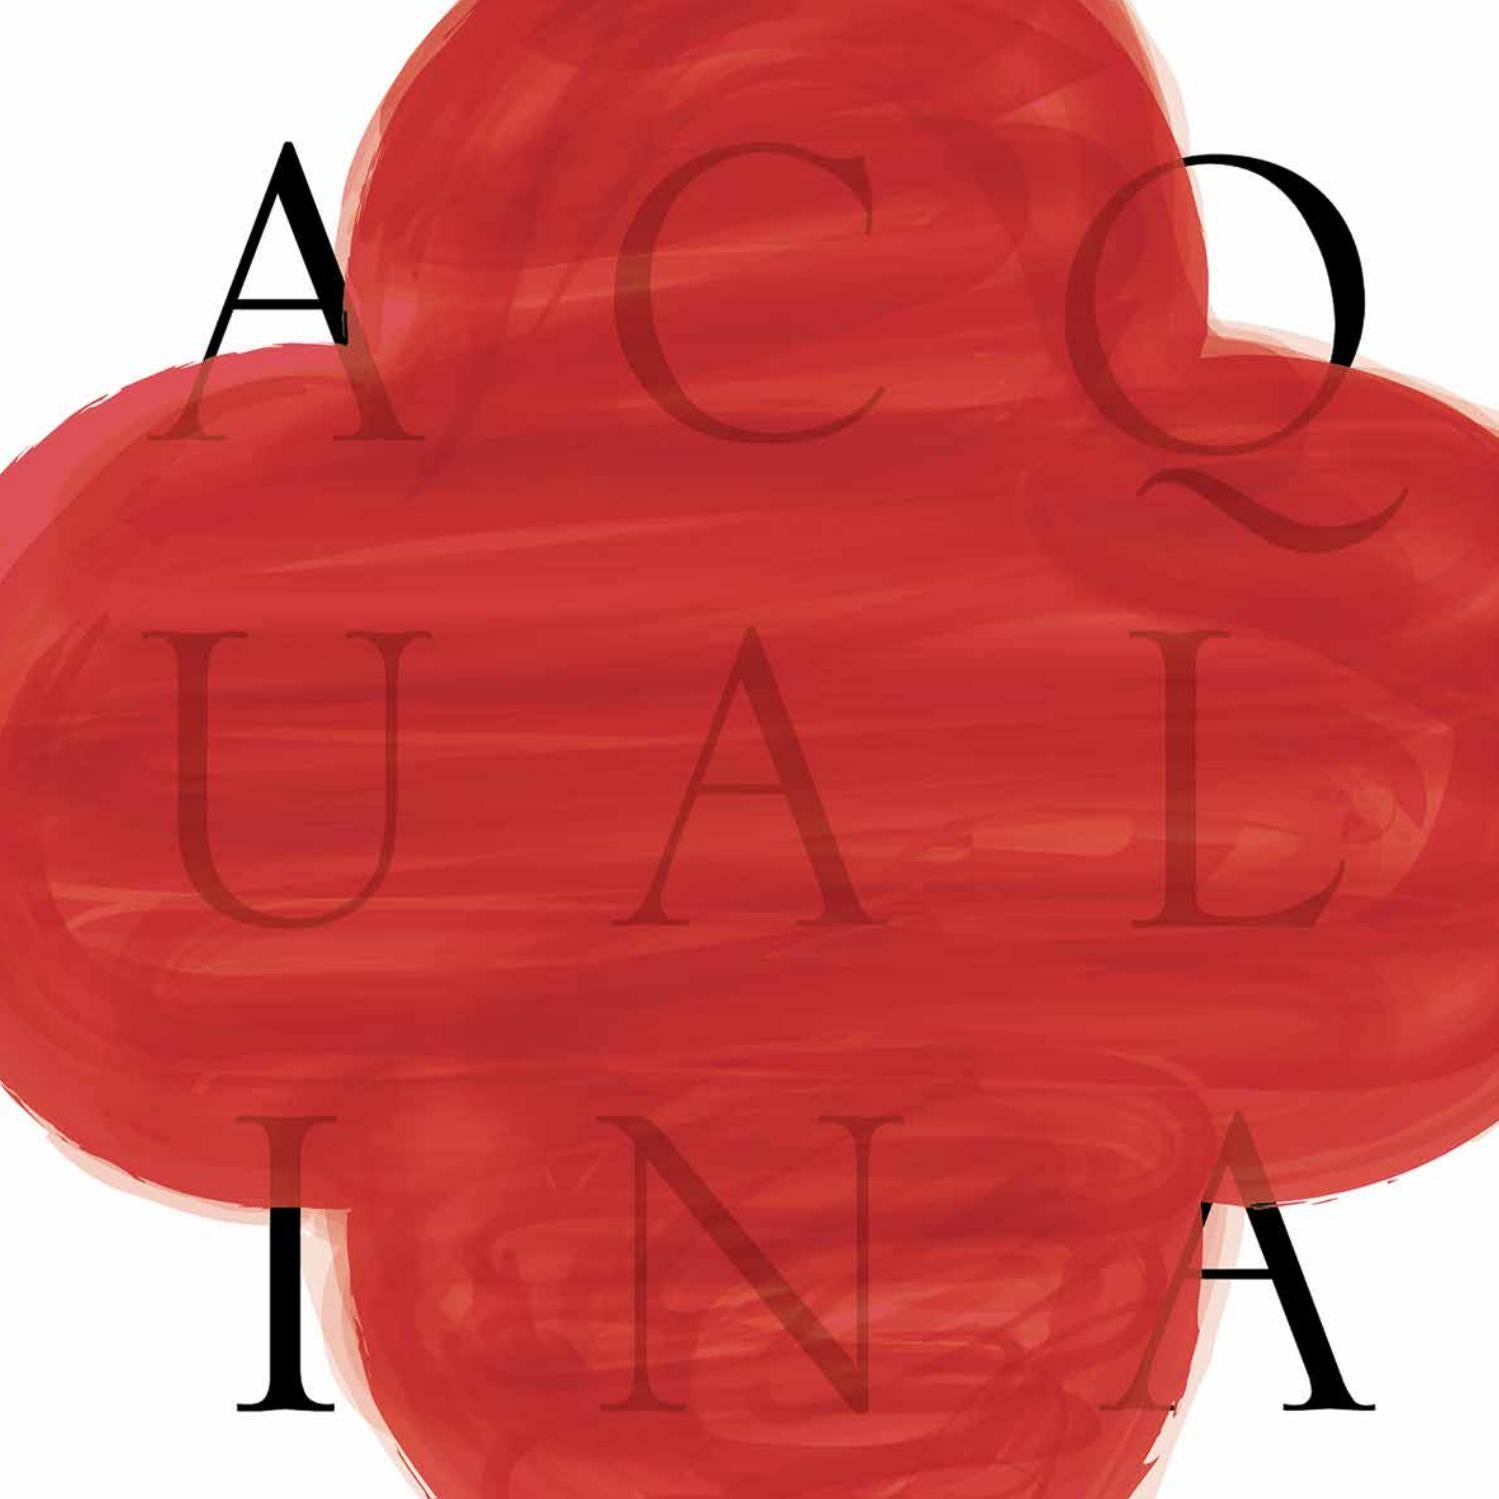 1a191d8987 Acqualina Luxury Art Book 2018 by Luxury Art Book - issuu